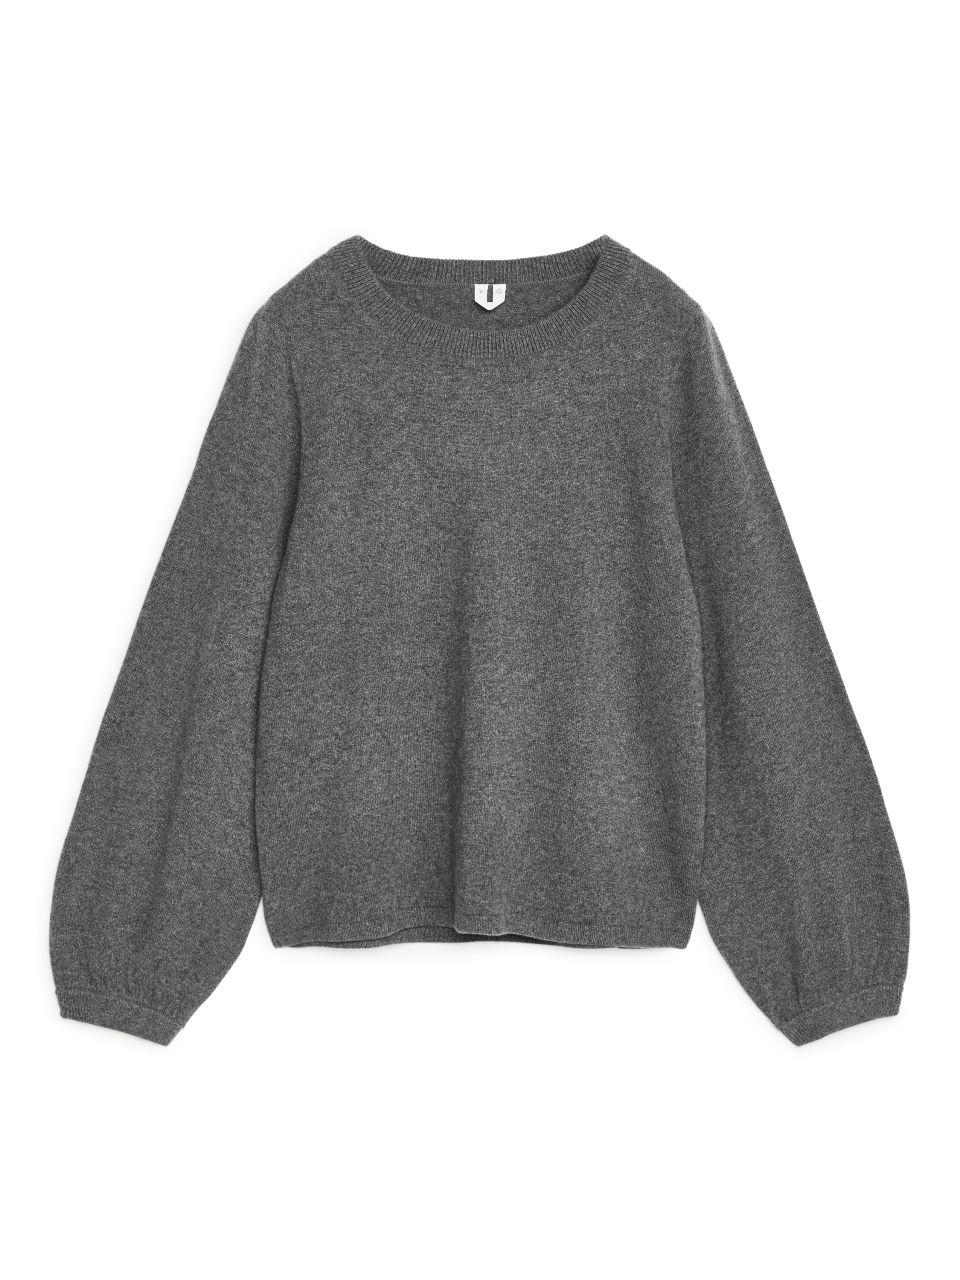 Bell Sleeve Cashmere Jumper - Grey